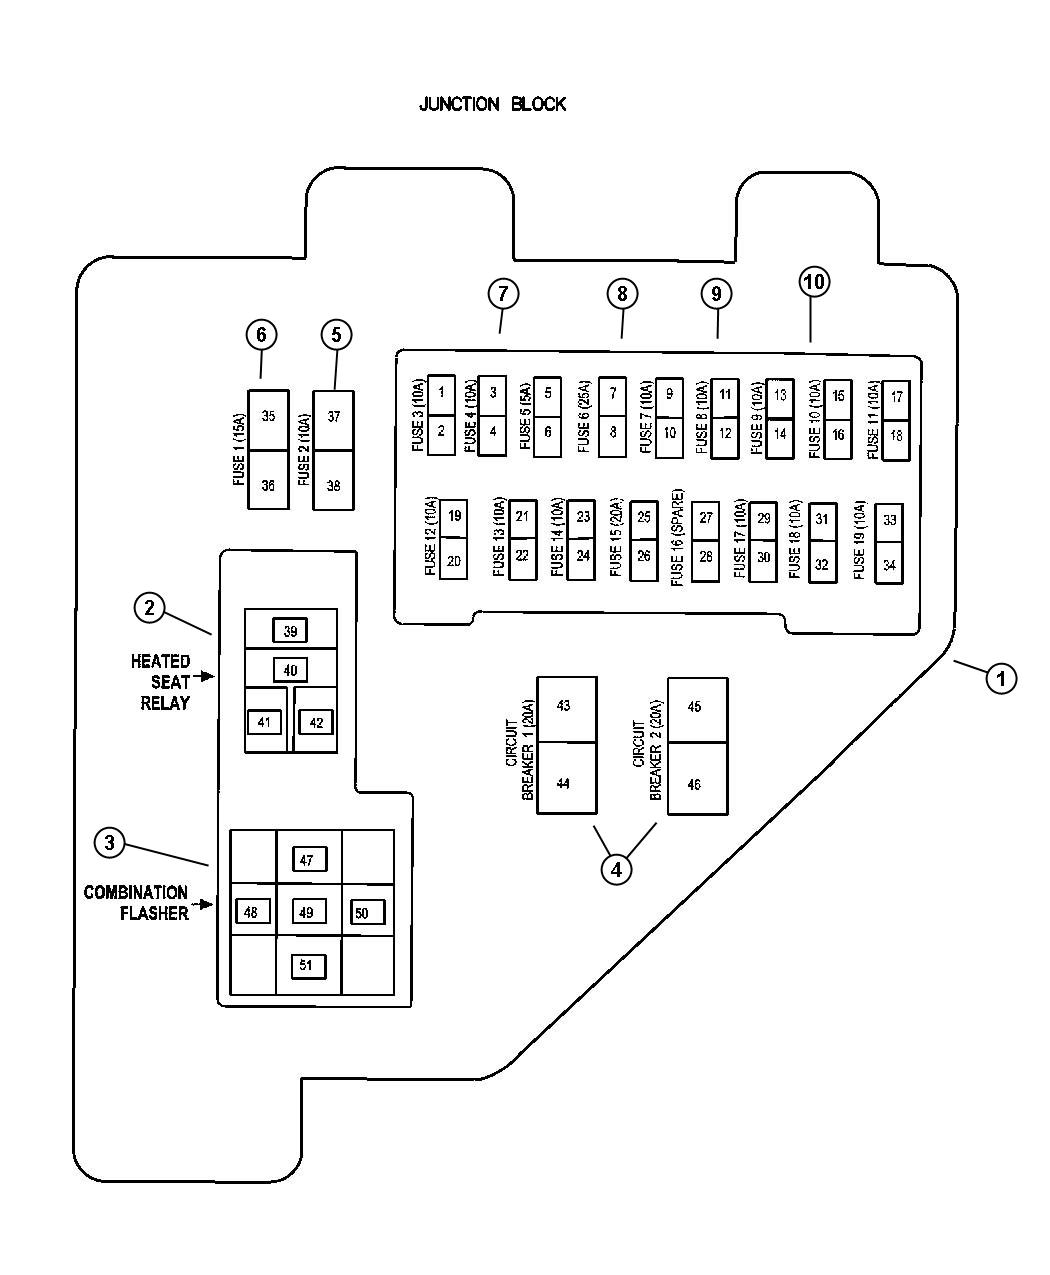 1998 Dodge Ram Fuse Box Diagram Free Download